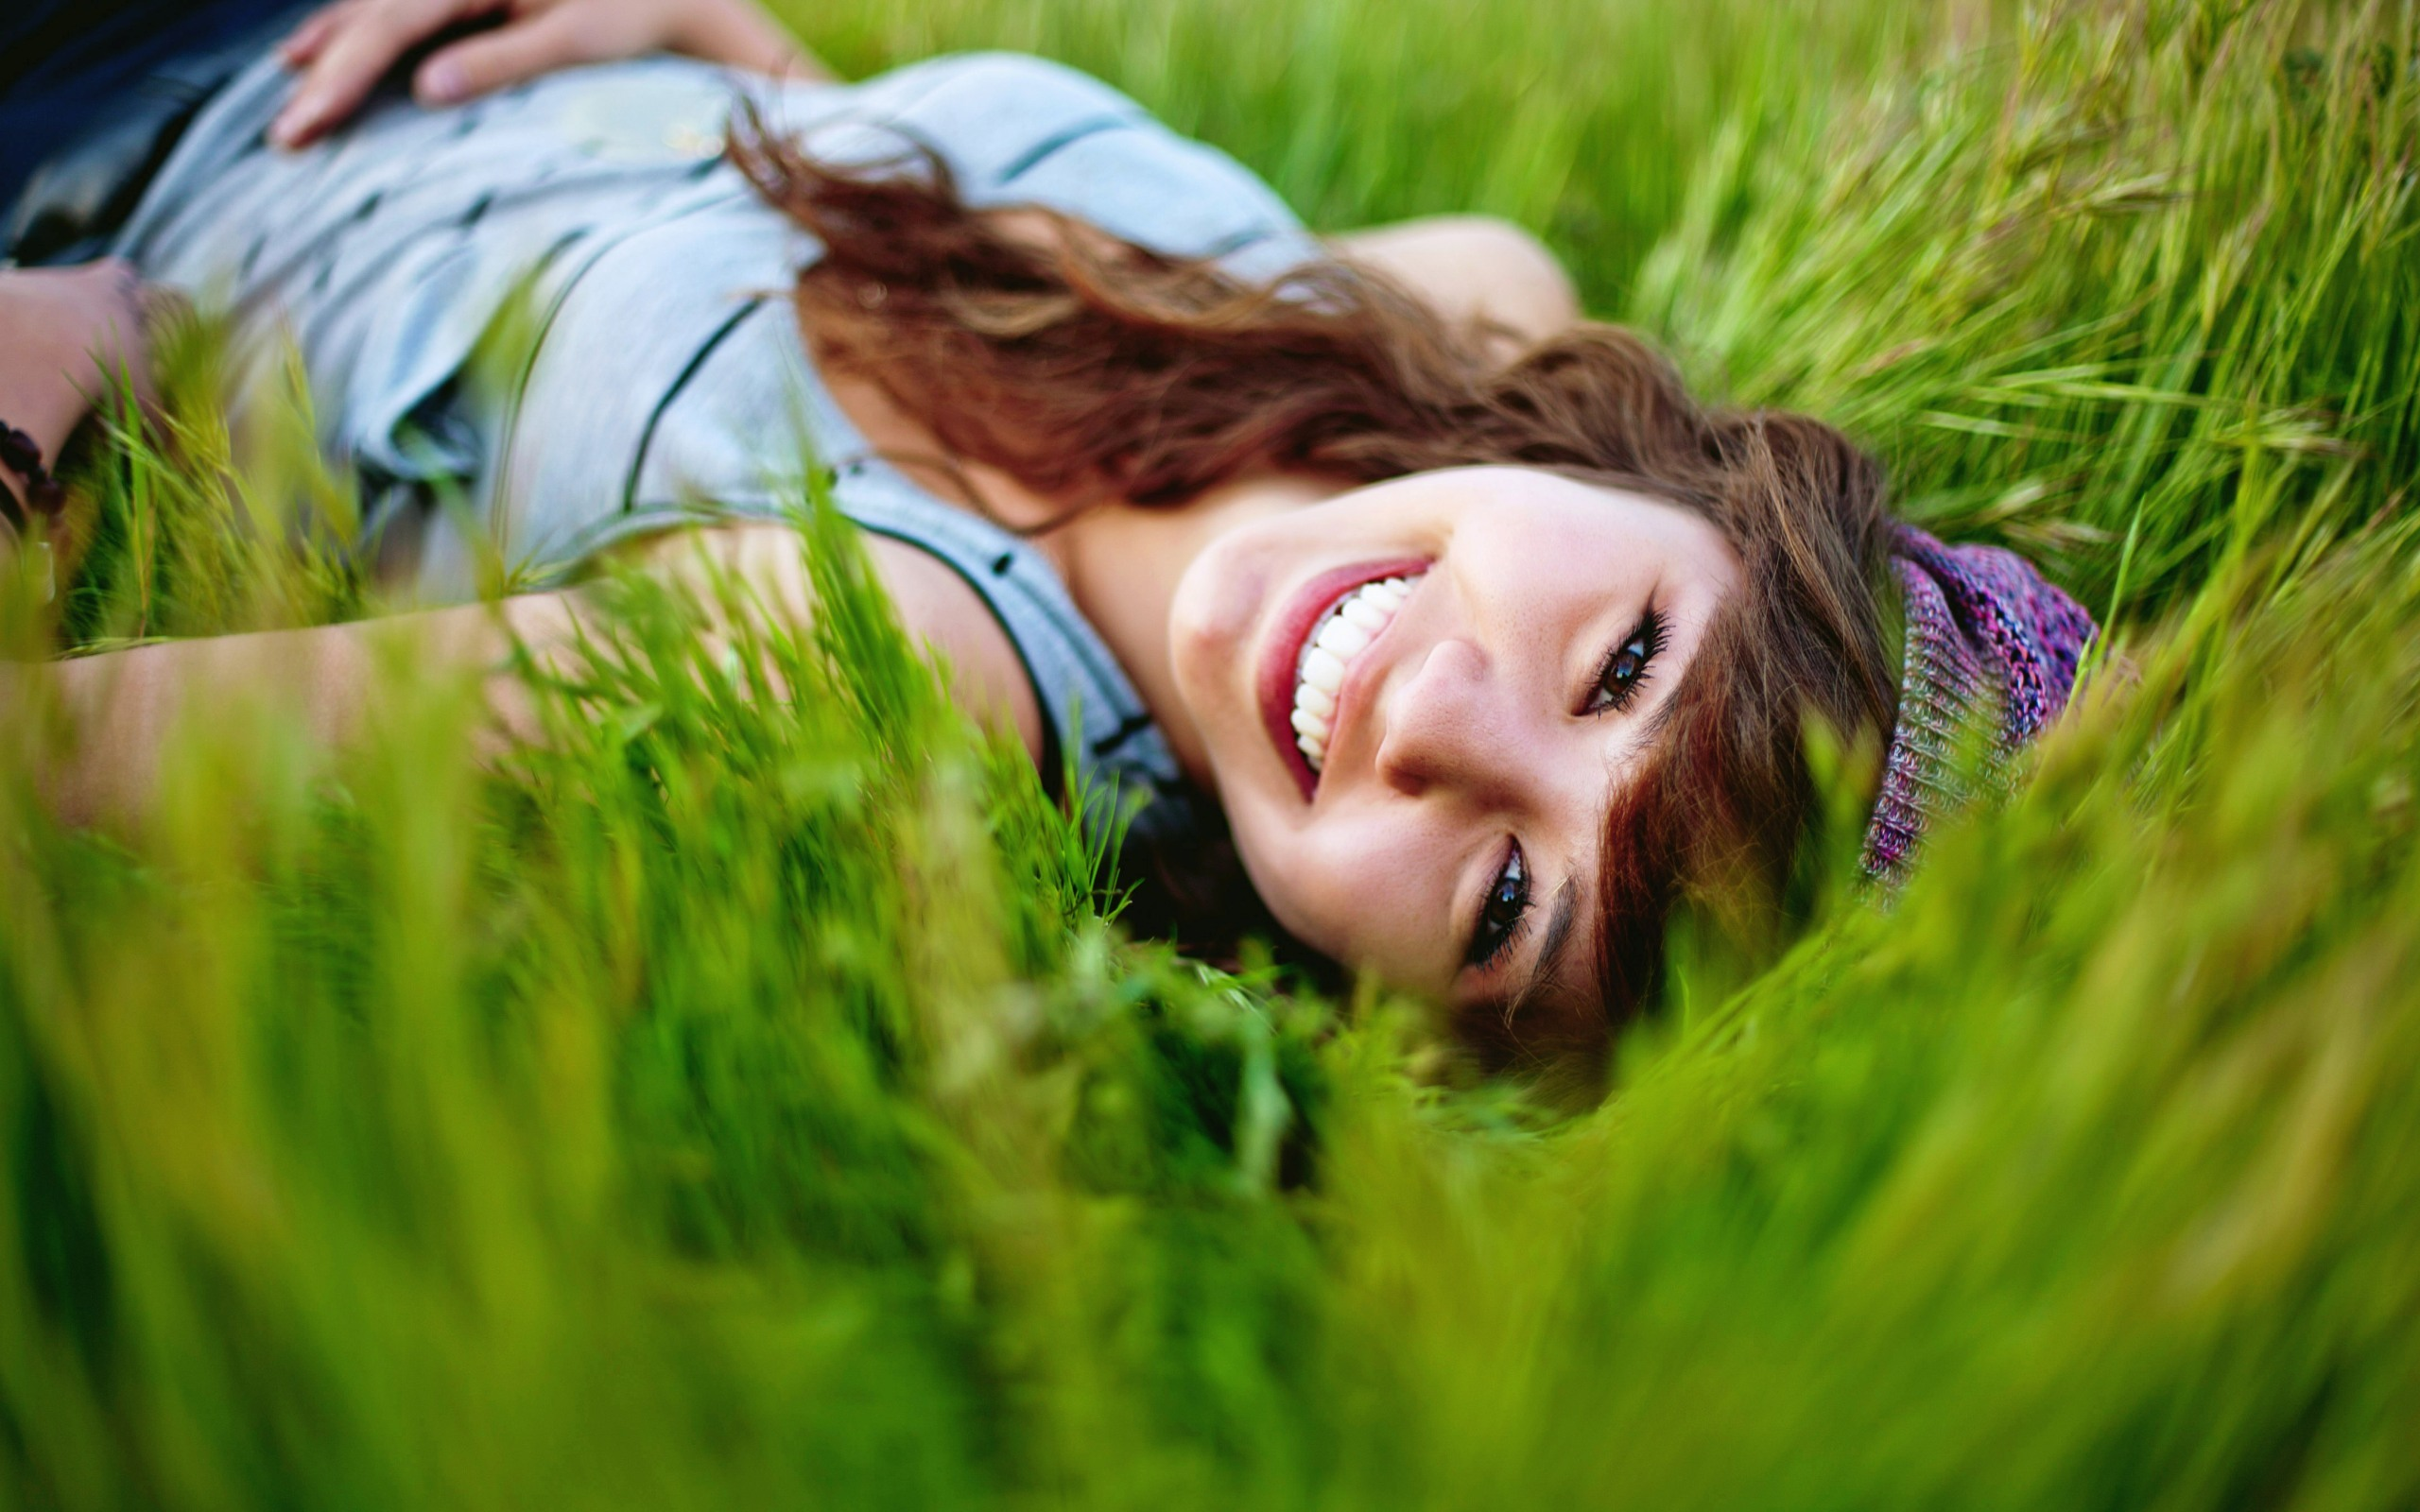 Девушка в траве  № 559808 бесплатно